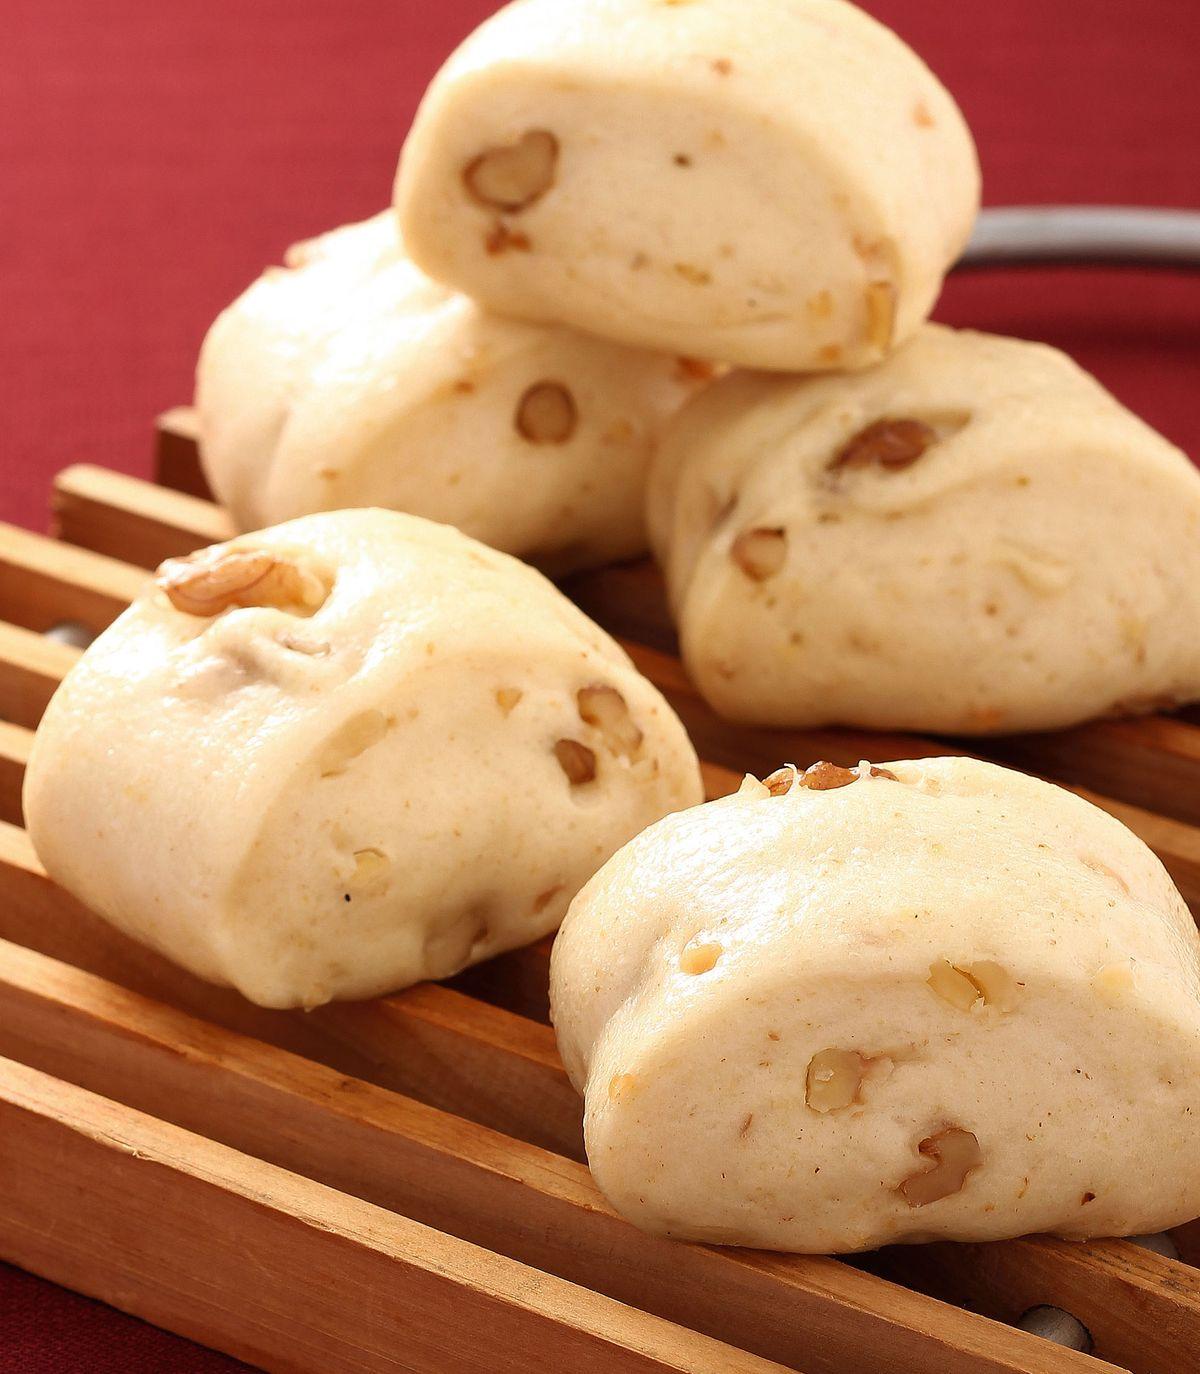 食譜:胚芽堅果小饅頭